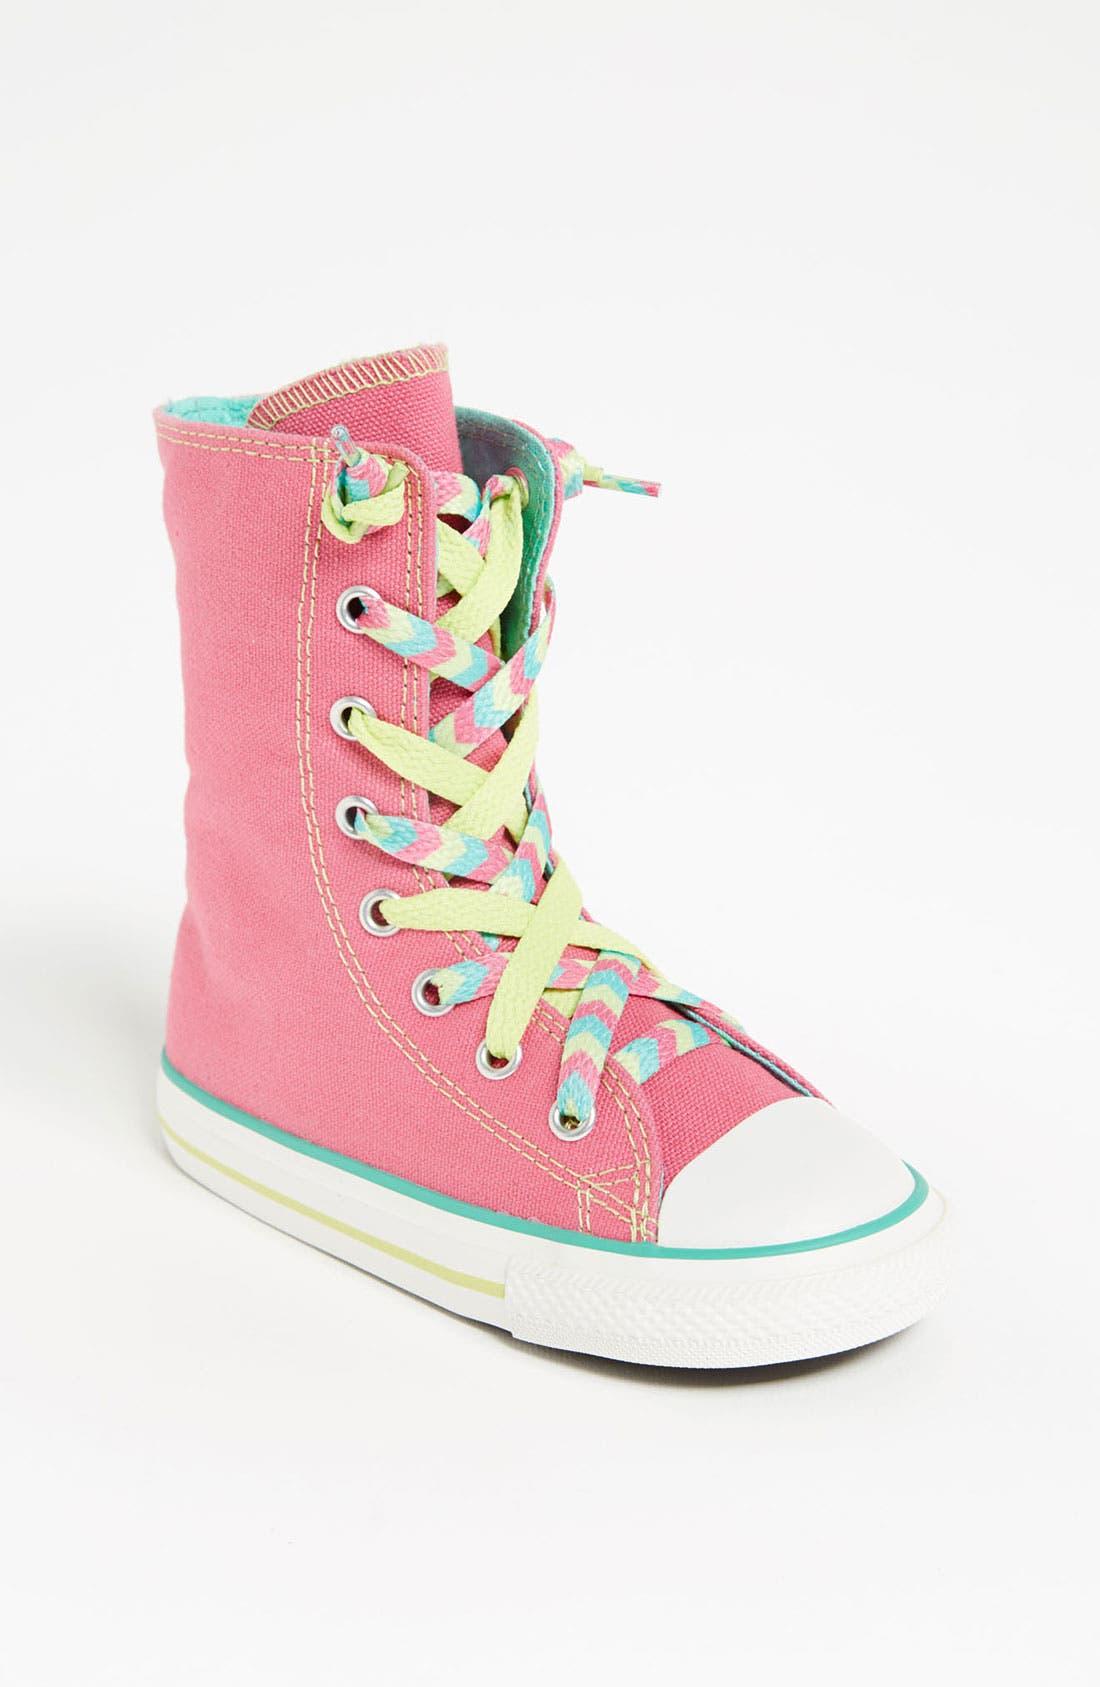 Alternate Image 1 Selected - Converse Chuck Taylor® All Star® 'X-Hi' Sneaker (Baby, Walker & Toddler)